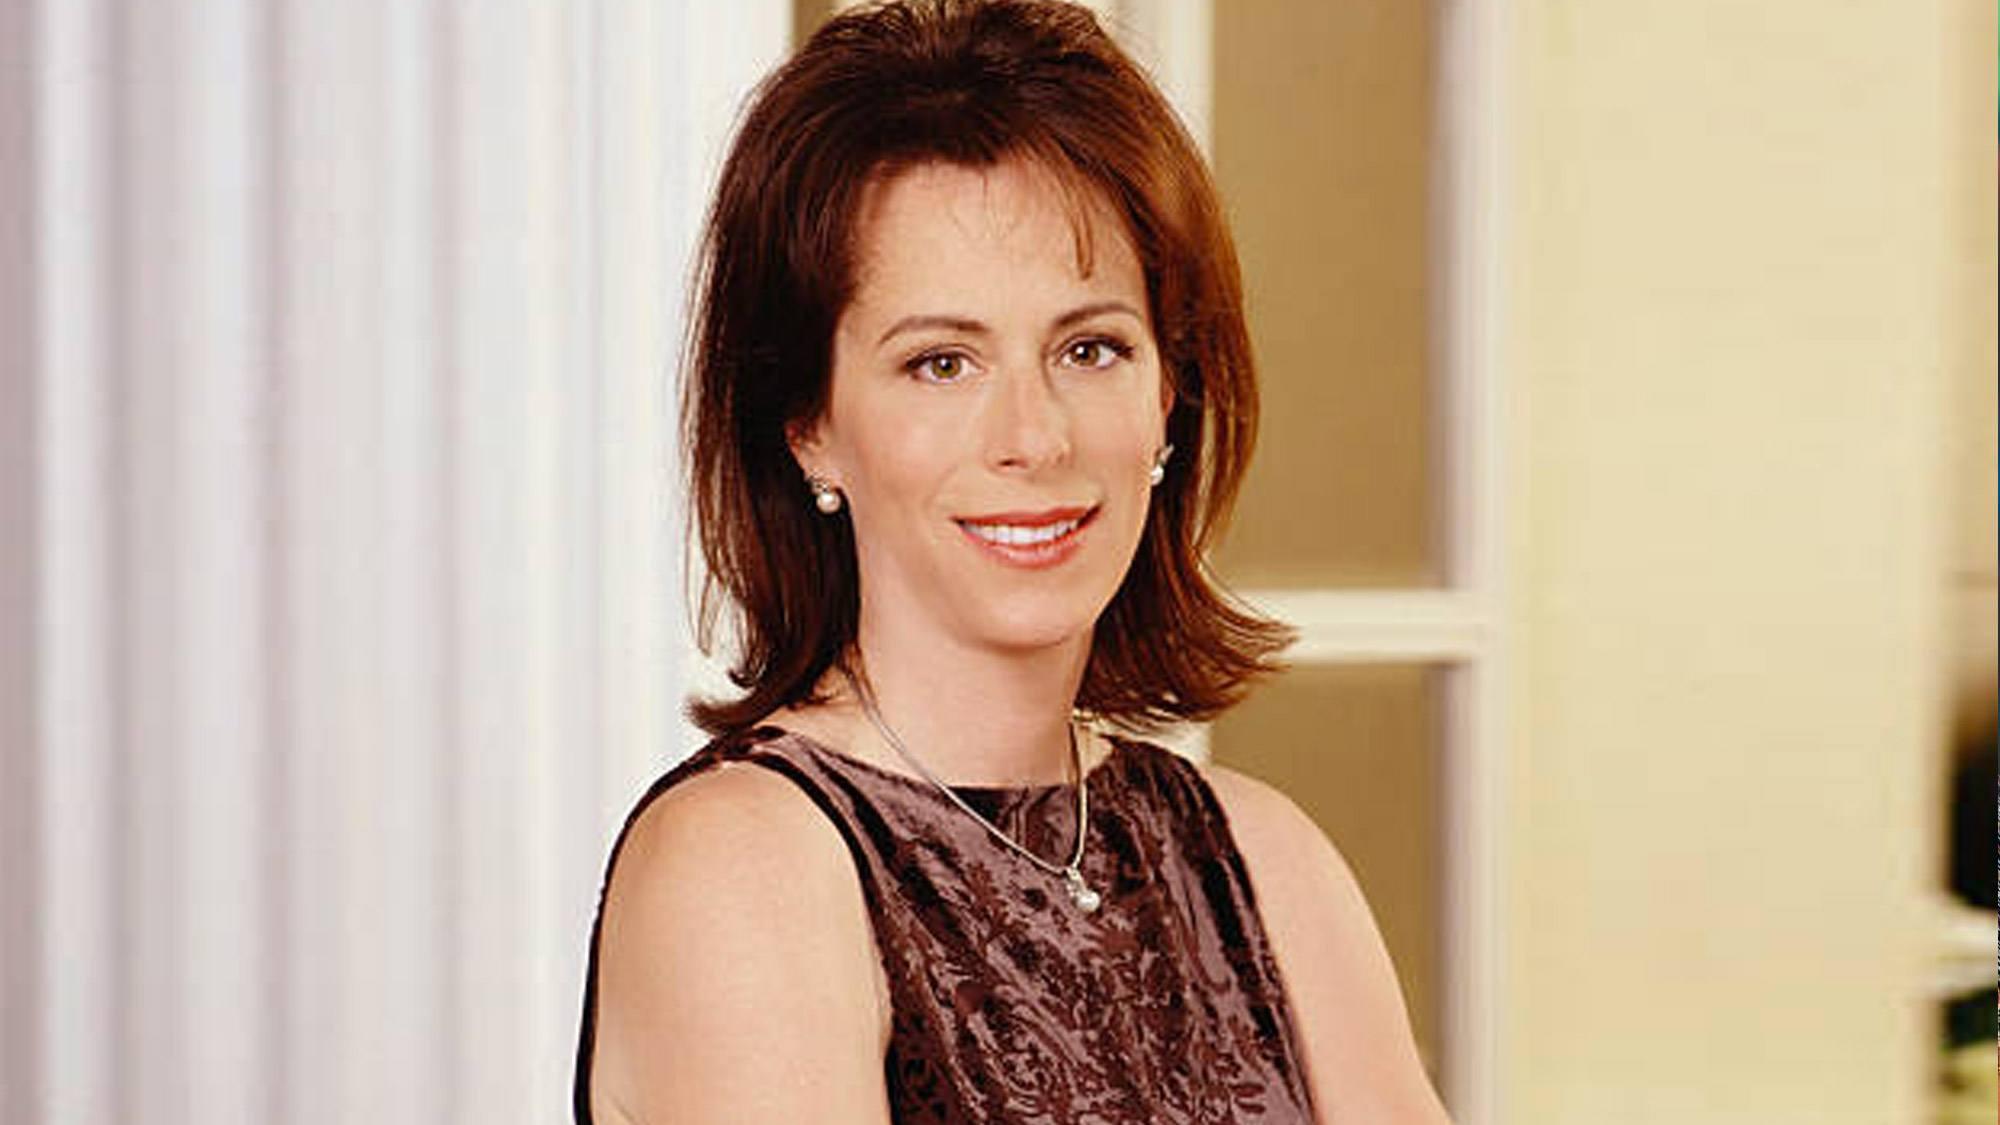 Jane Kaczmarek dans le téléfilm <em>Jenifer</em> sur M6